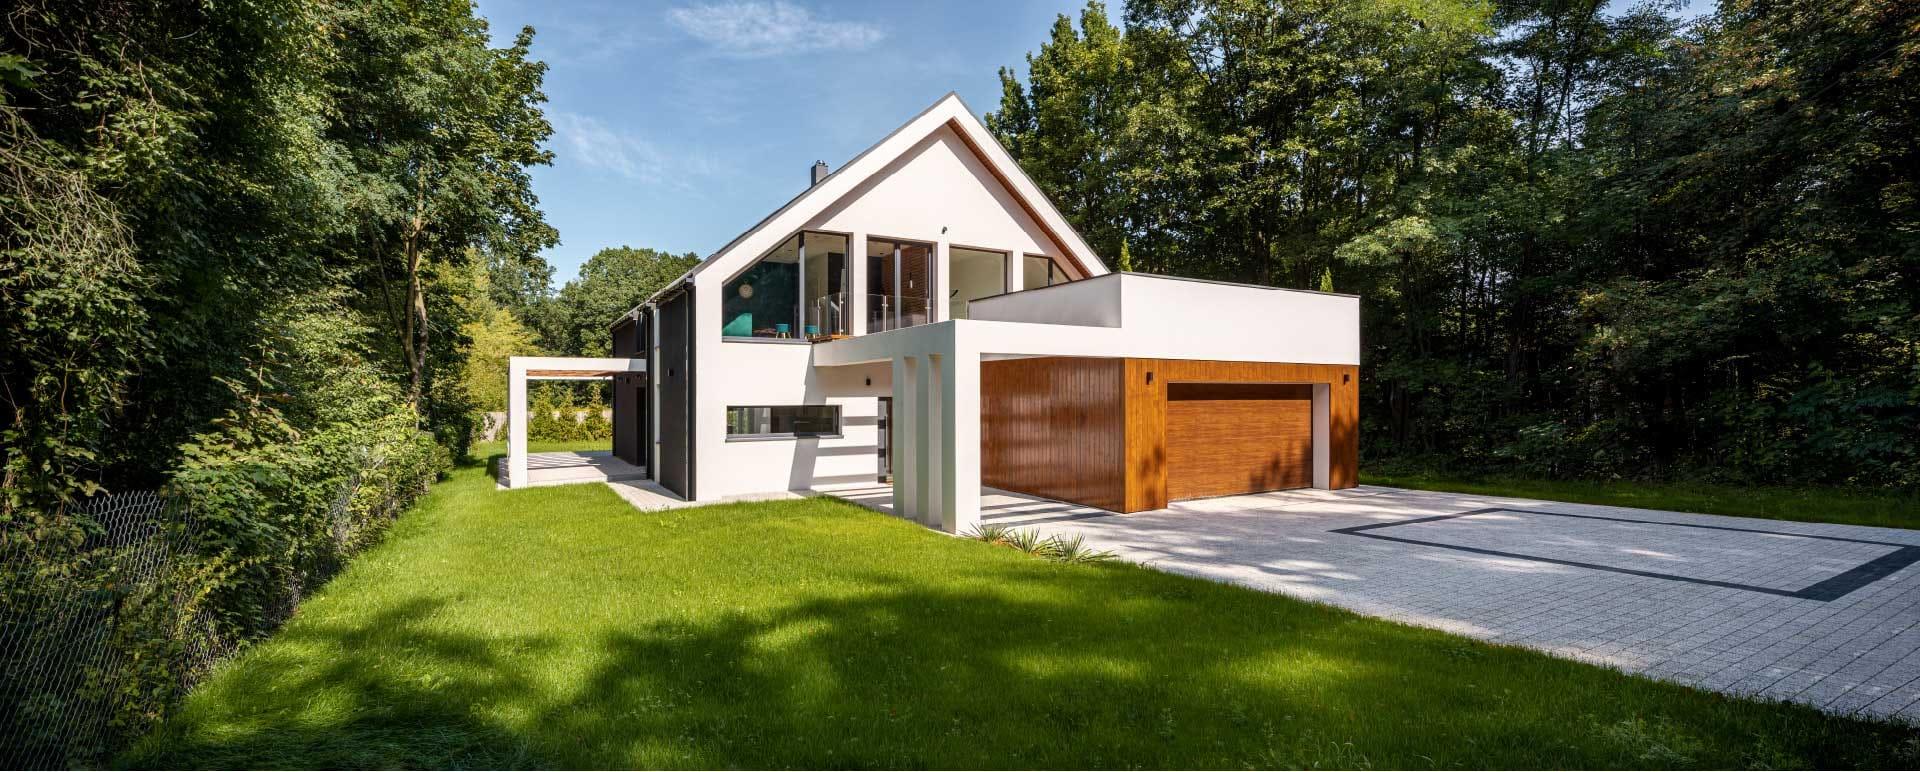 Tagalo - dom energooszczędny